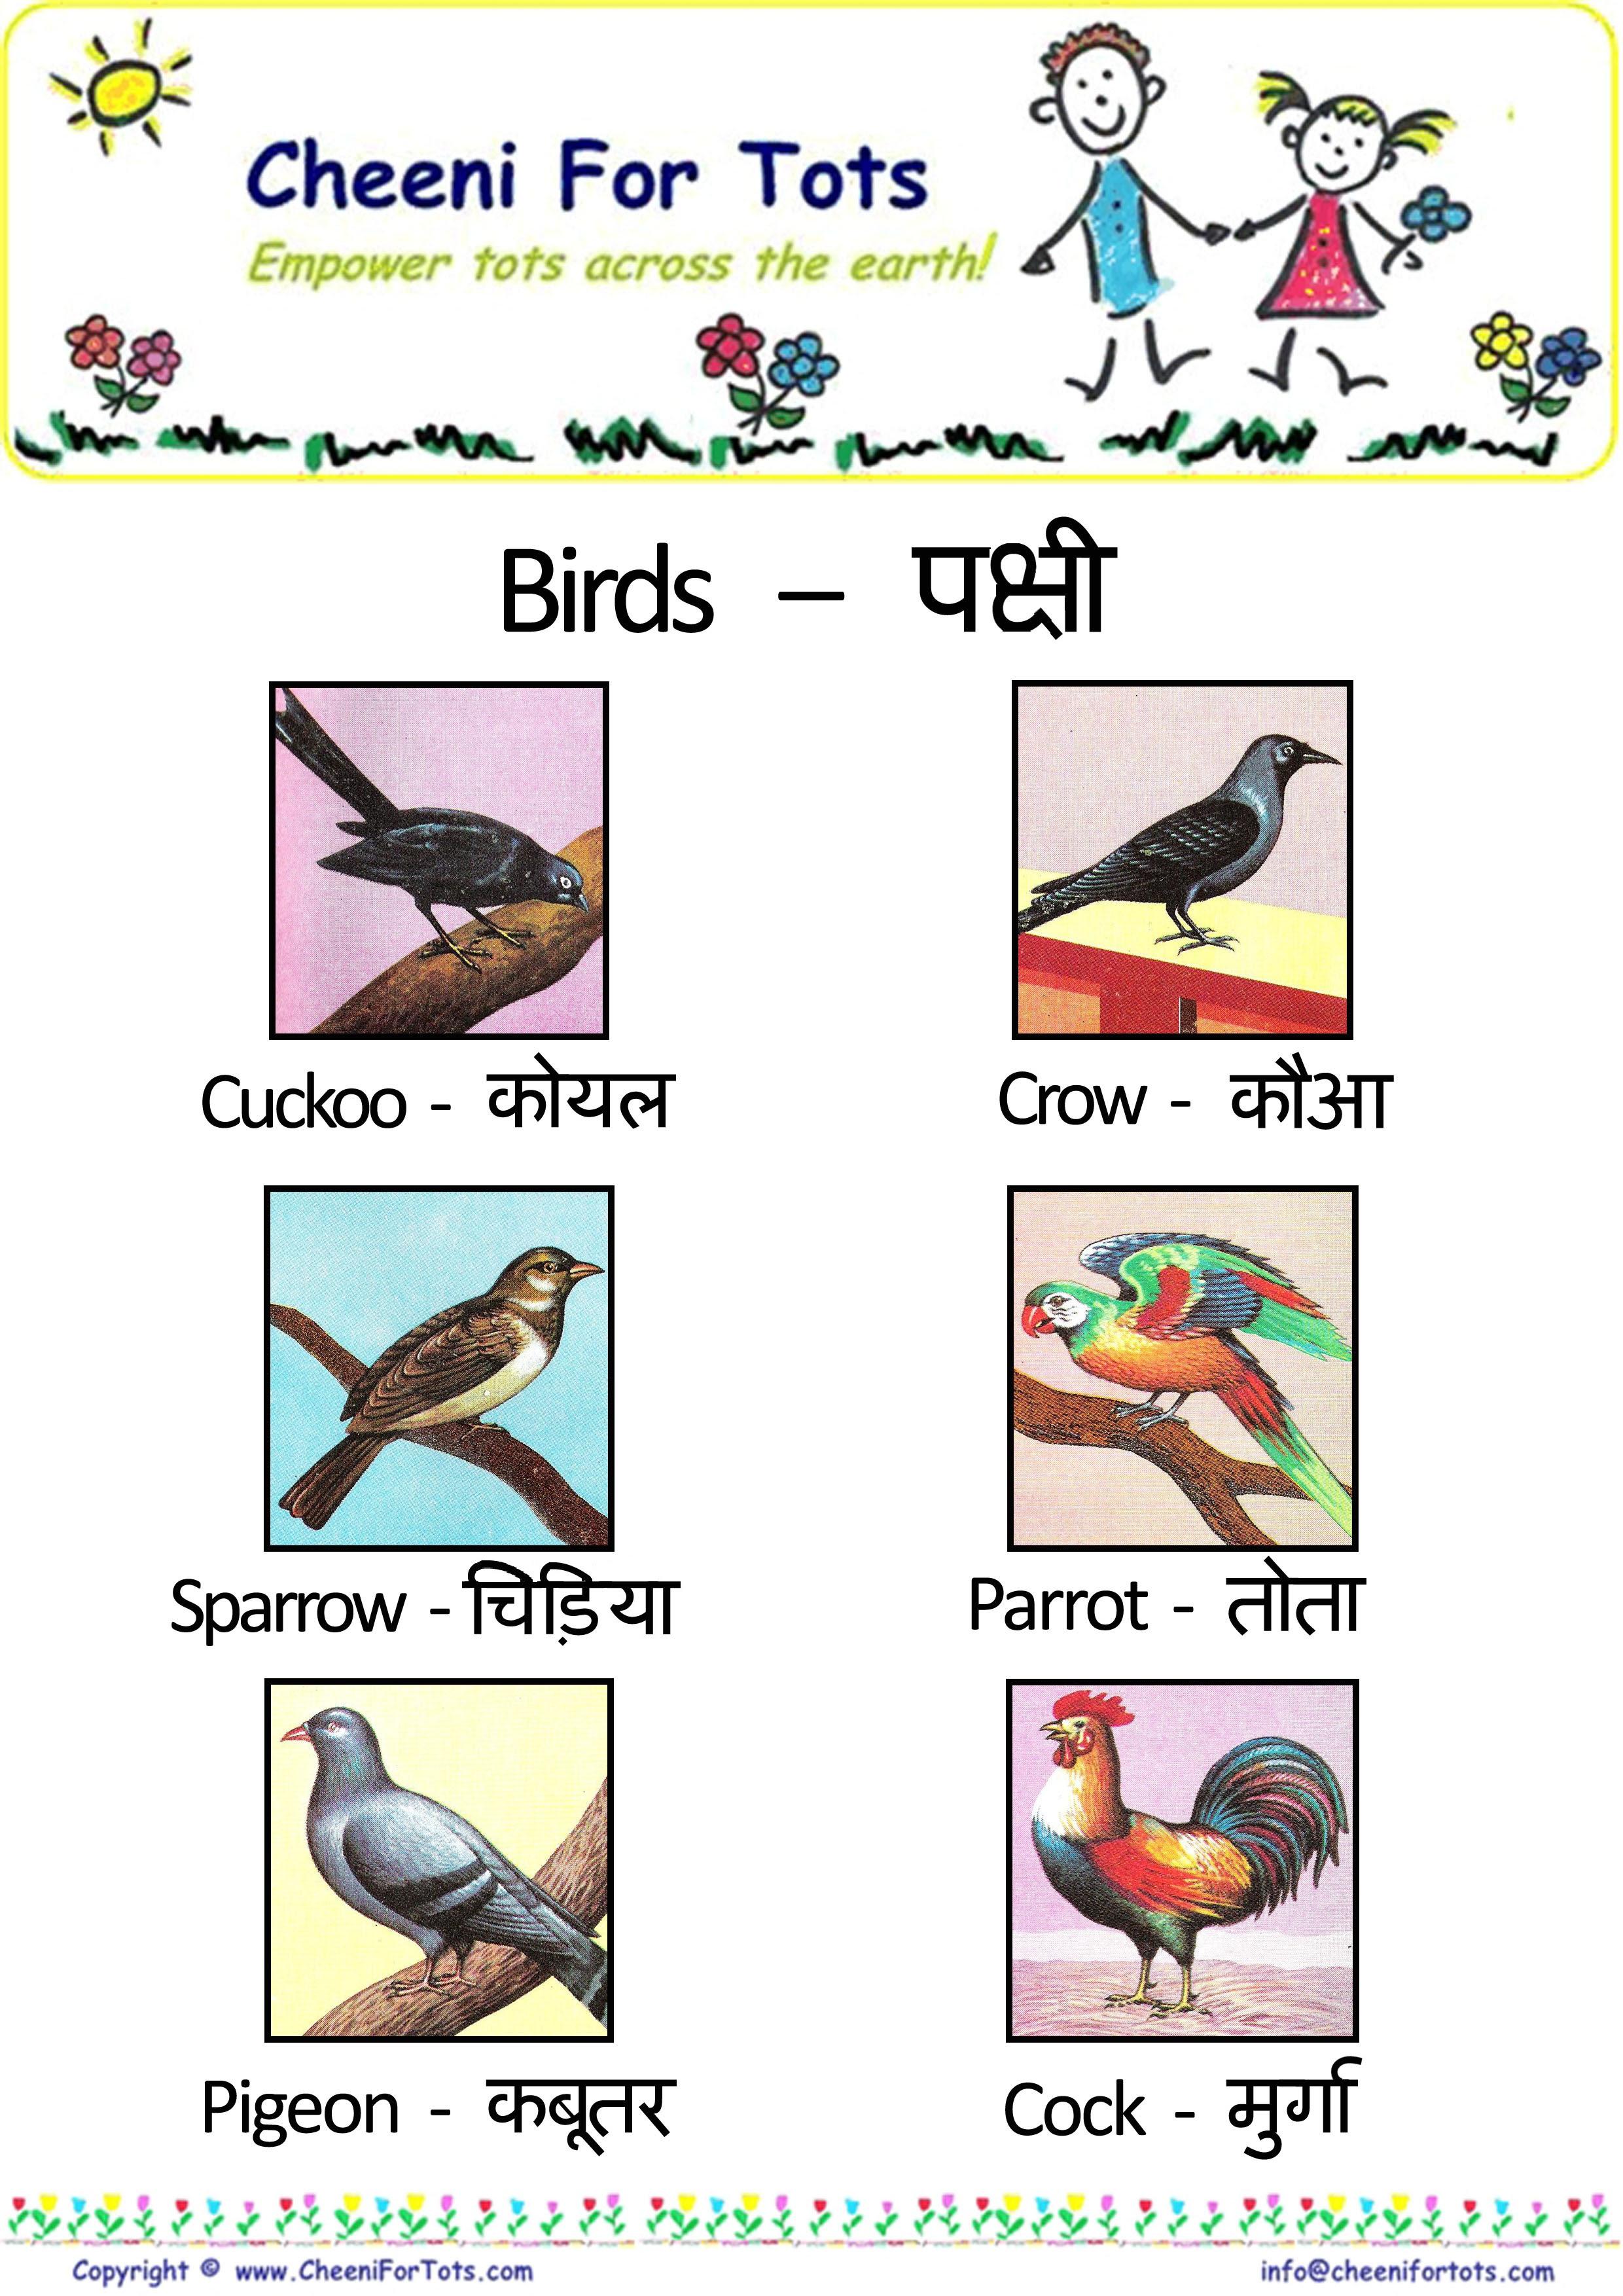 30 TUTORIAL HINDI LANGUAGE ANIMAL NAME WITH VIDEO AND PDF